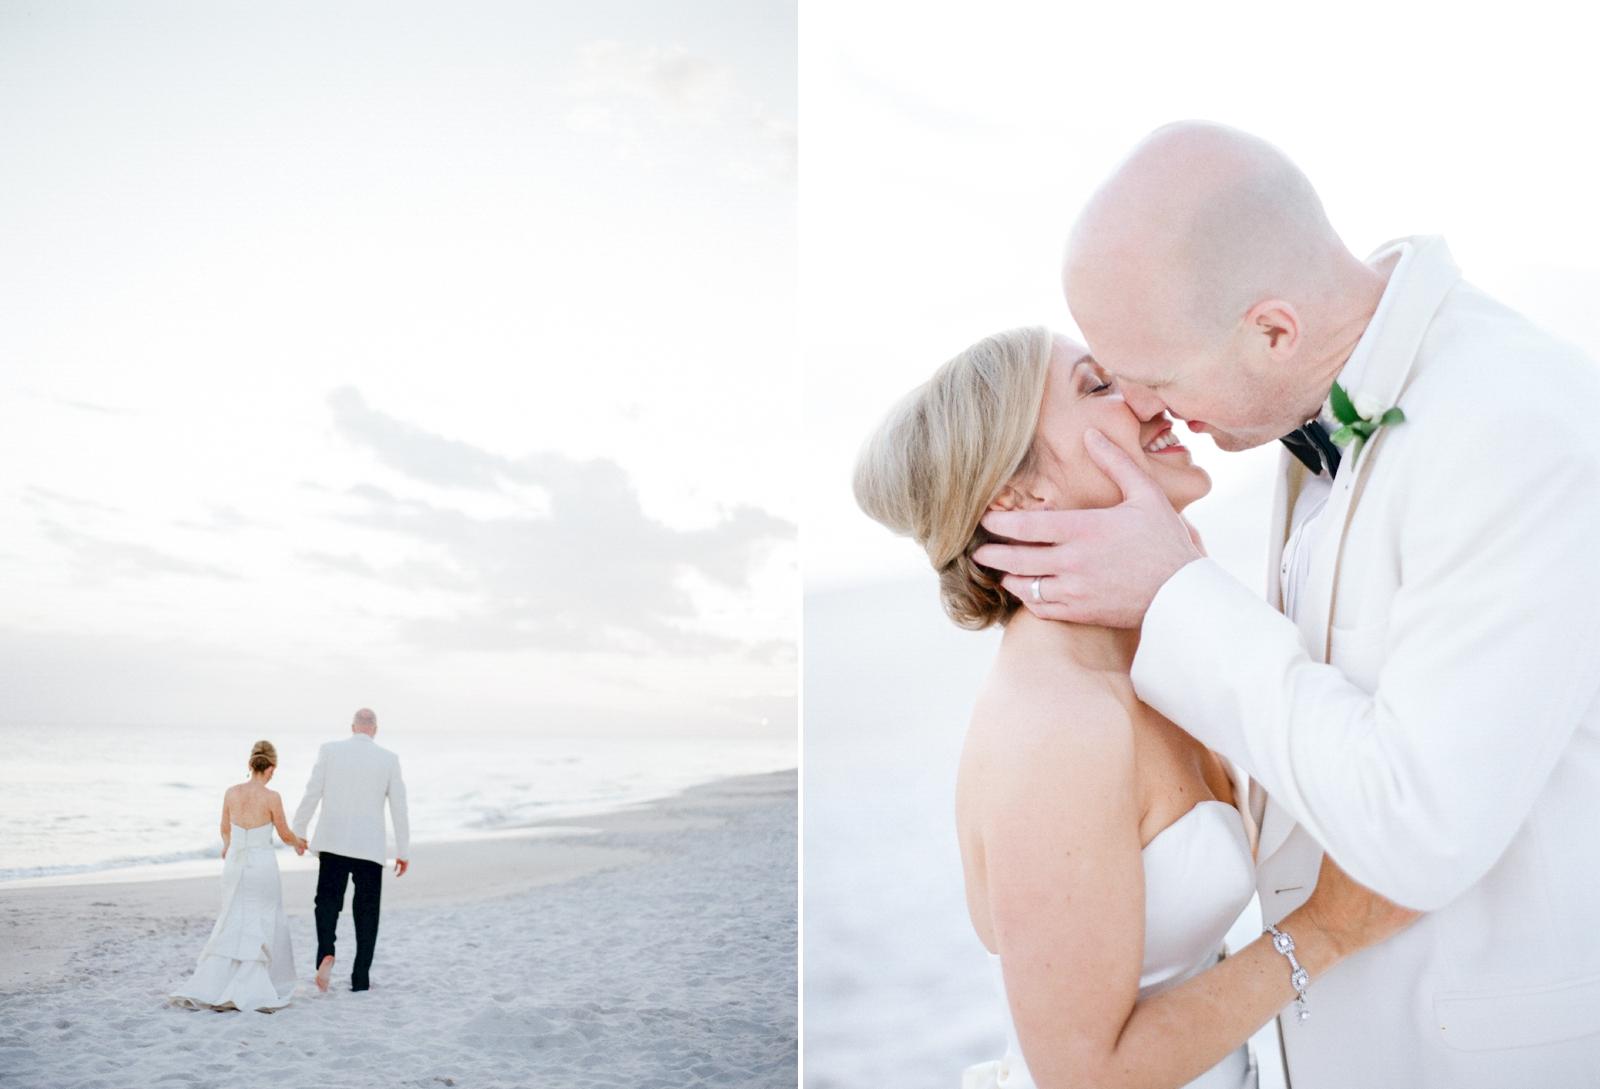 rosemary beach wedding photographer st augustine green rosemary beach shannon griffin_0001.jpg